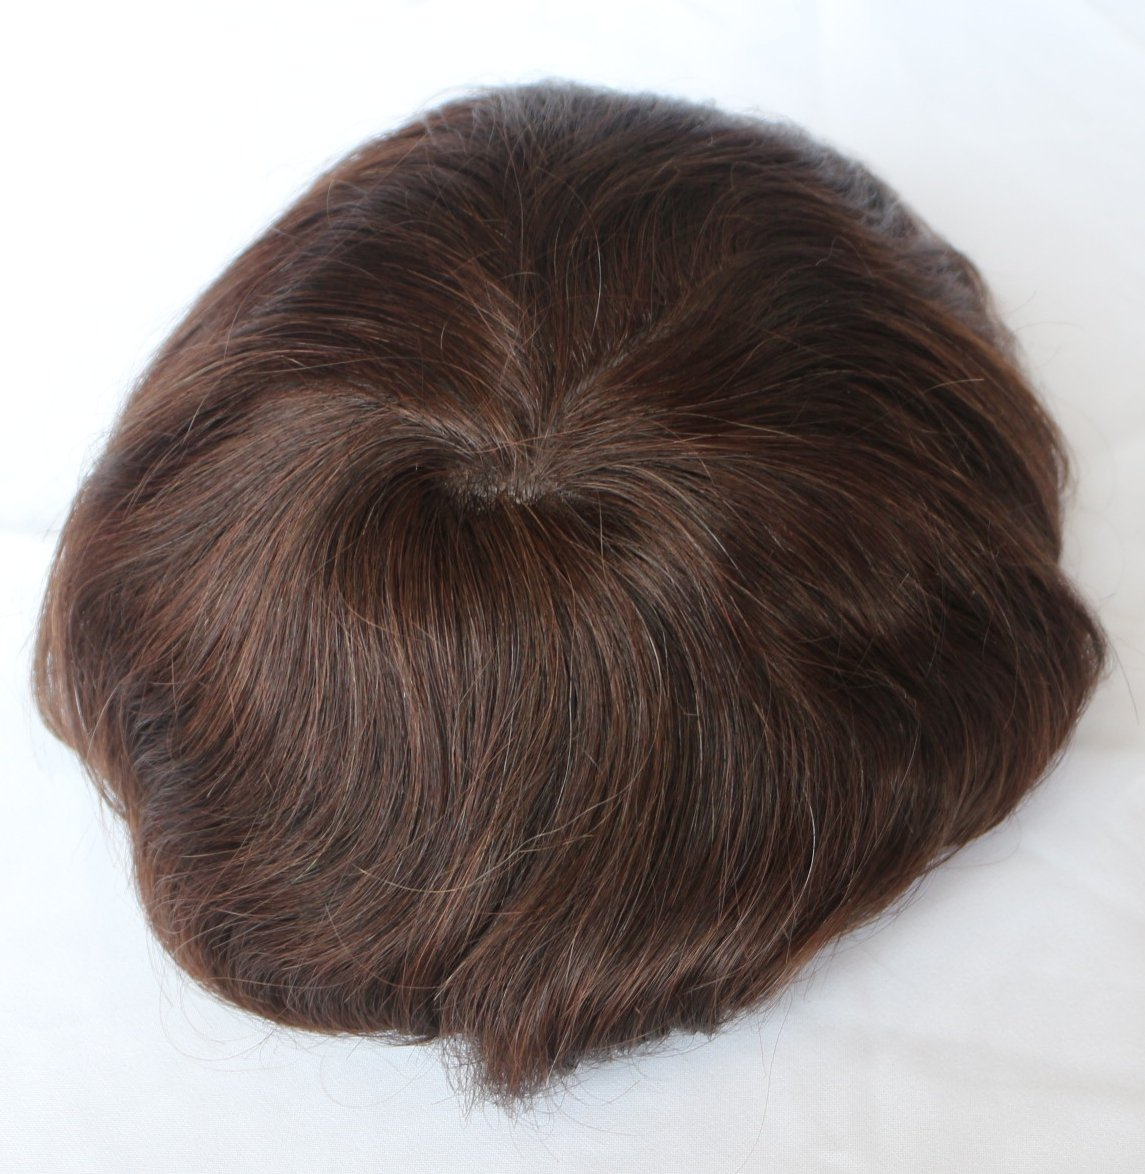 Human Hair 7x9 Swiss Lace Base Men's Toupee Hair Piece Hair System (Color 2)